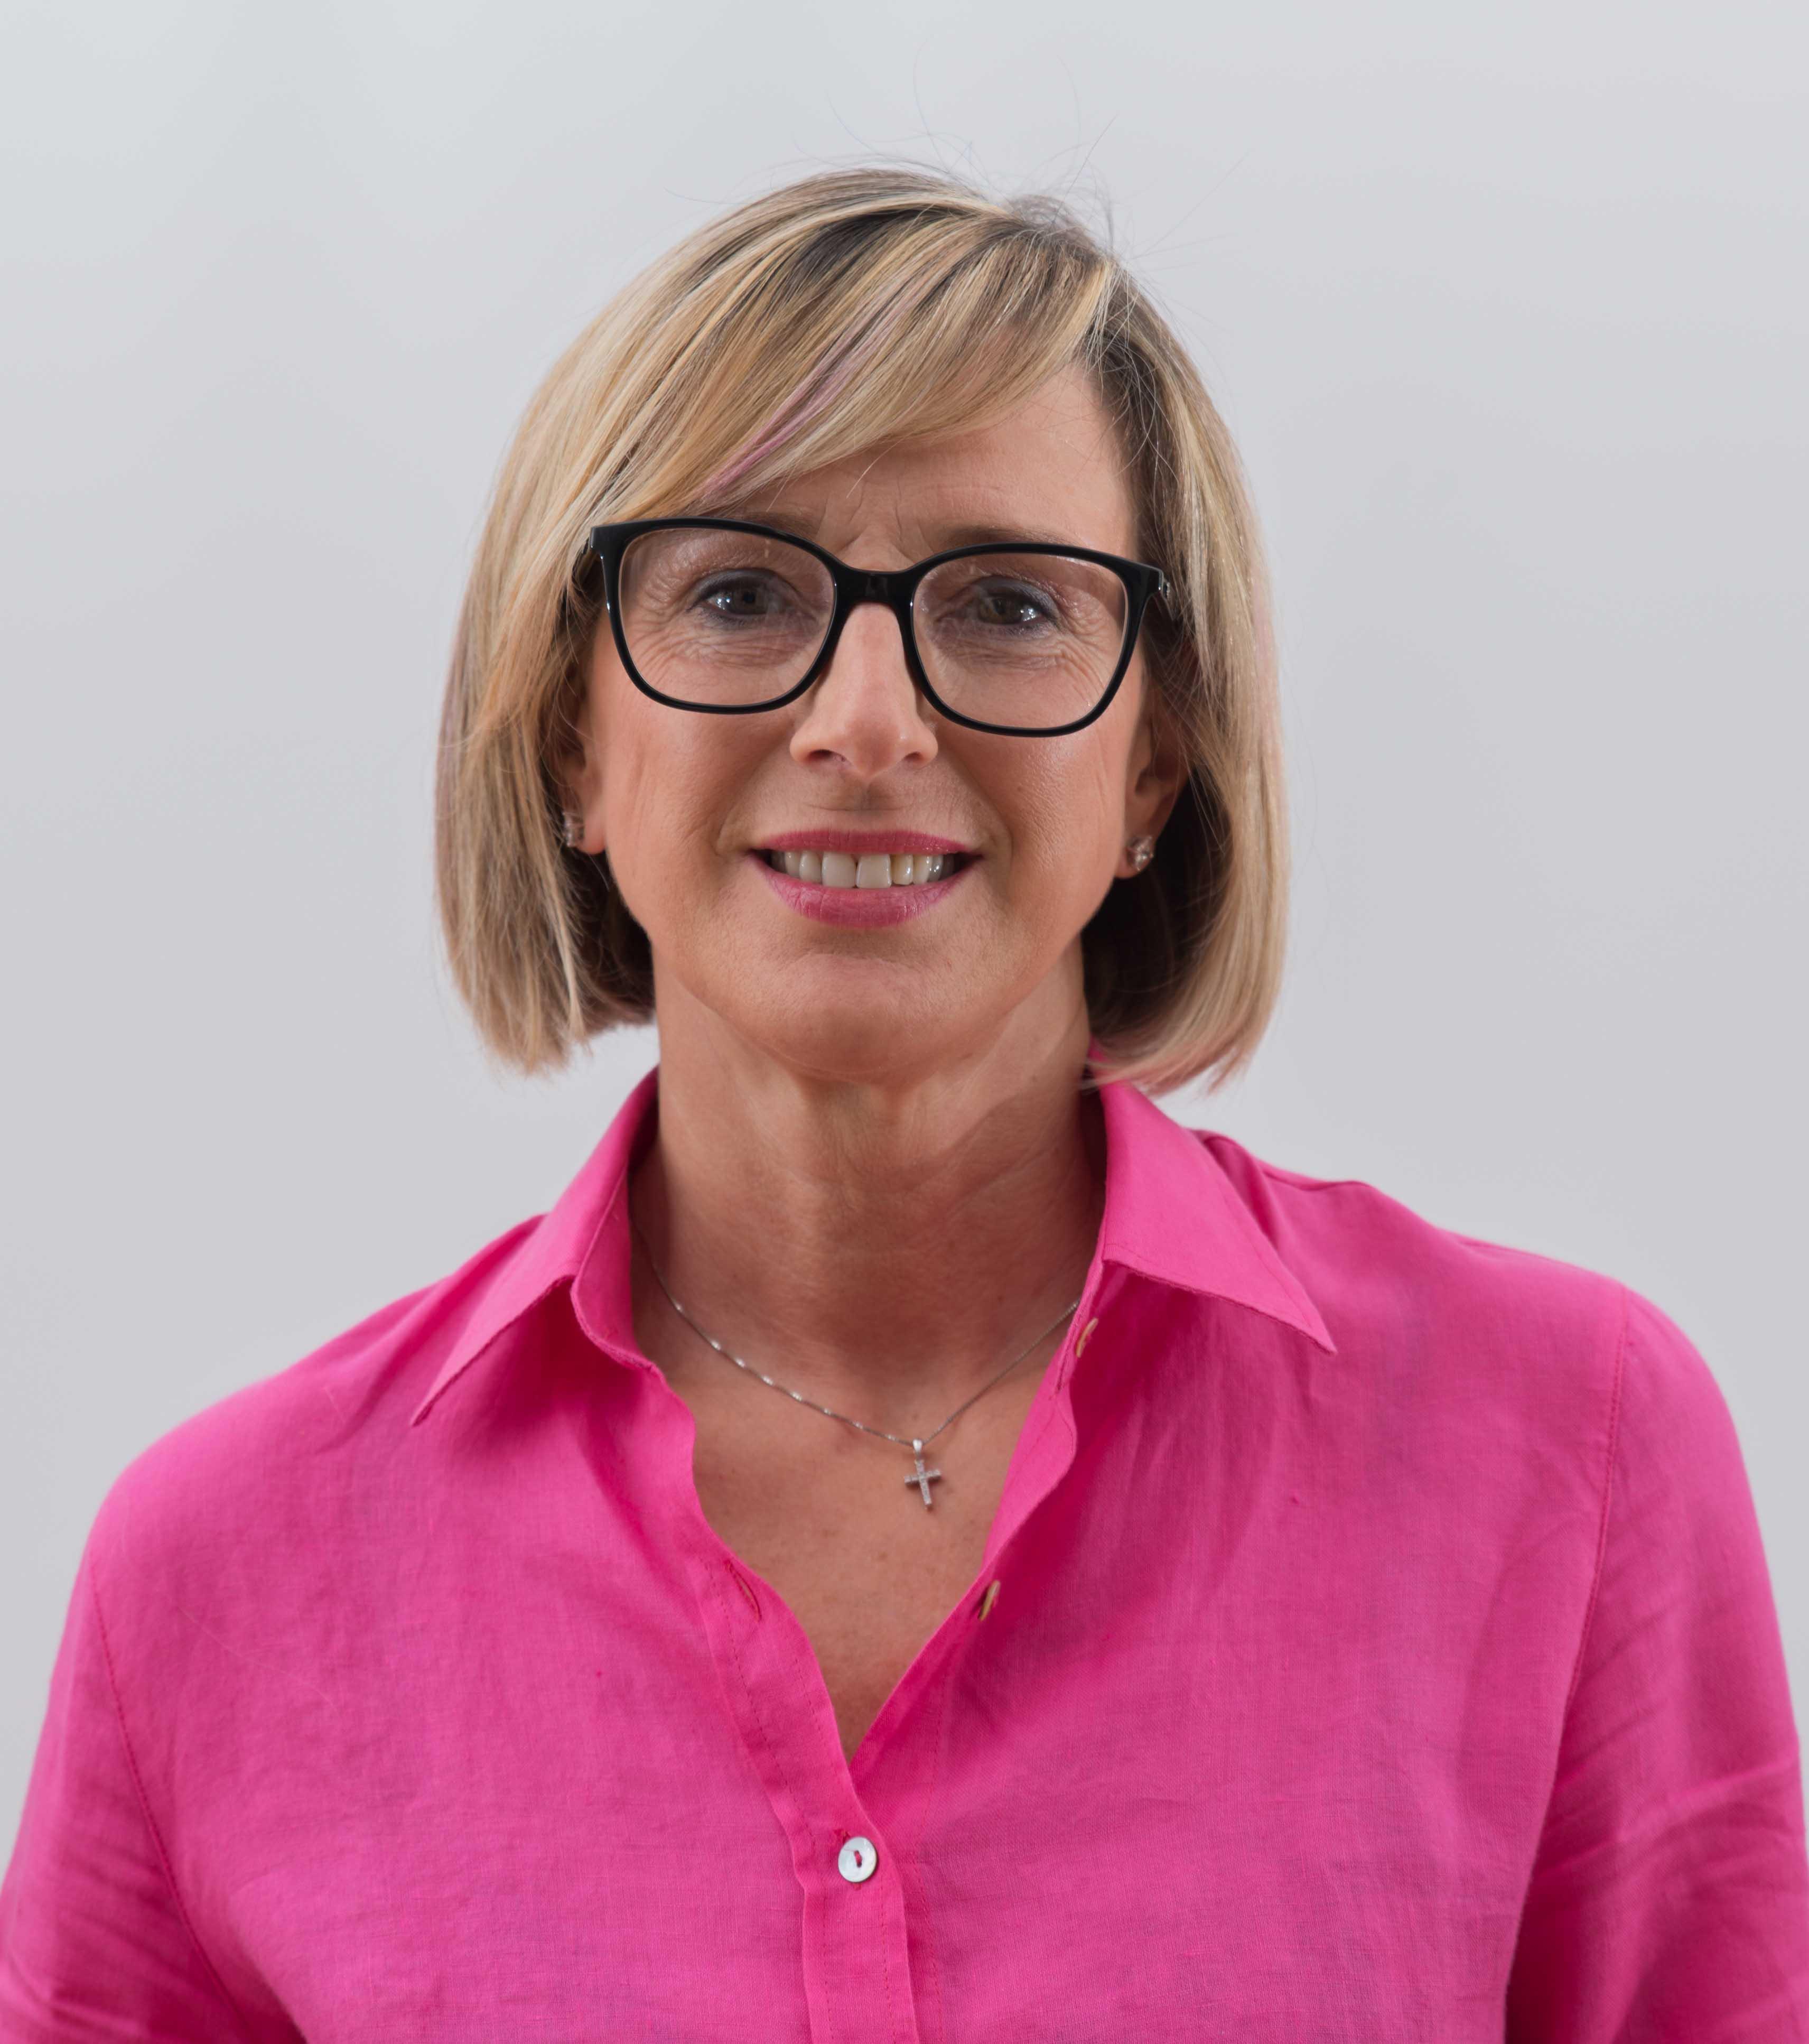 Maria Angela Saggin